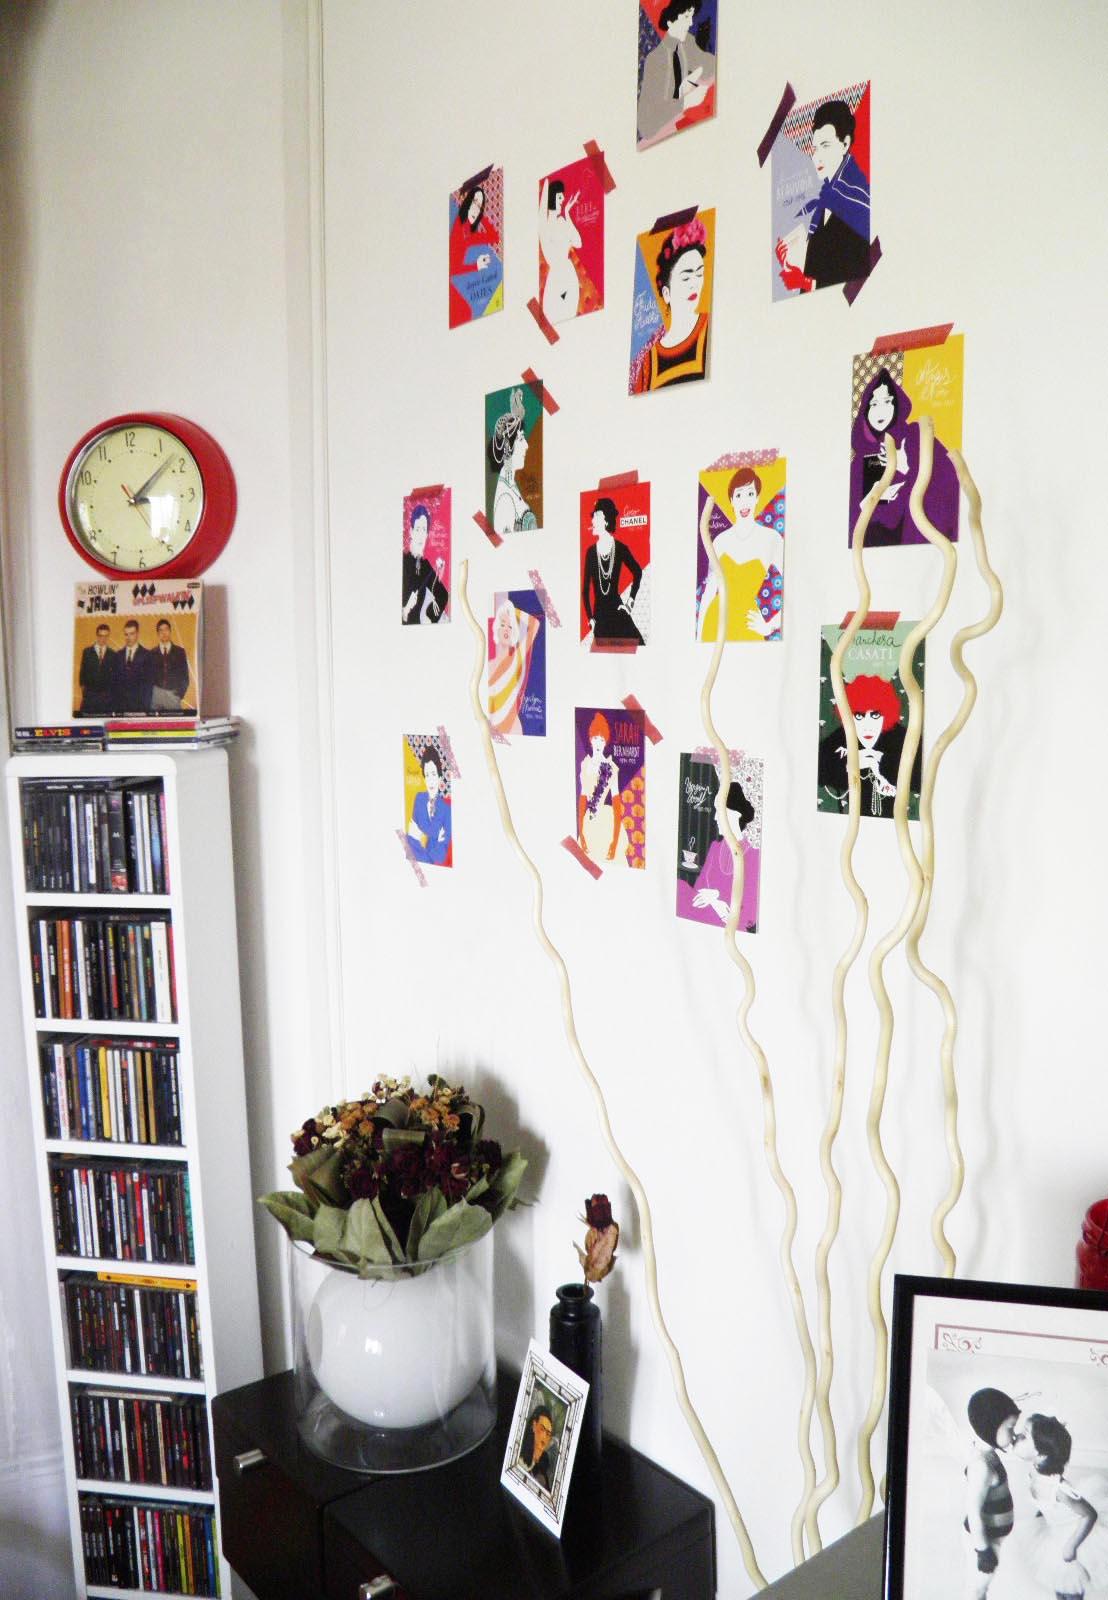 masking tape idee free masking tape idees masking tape. Black Bedroom Furniture Sets. Home Design Ideas